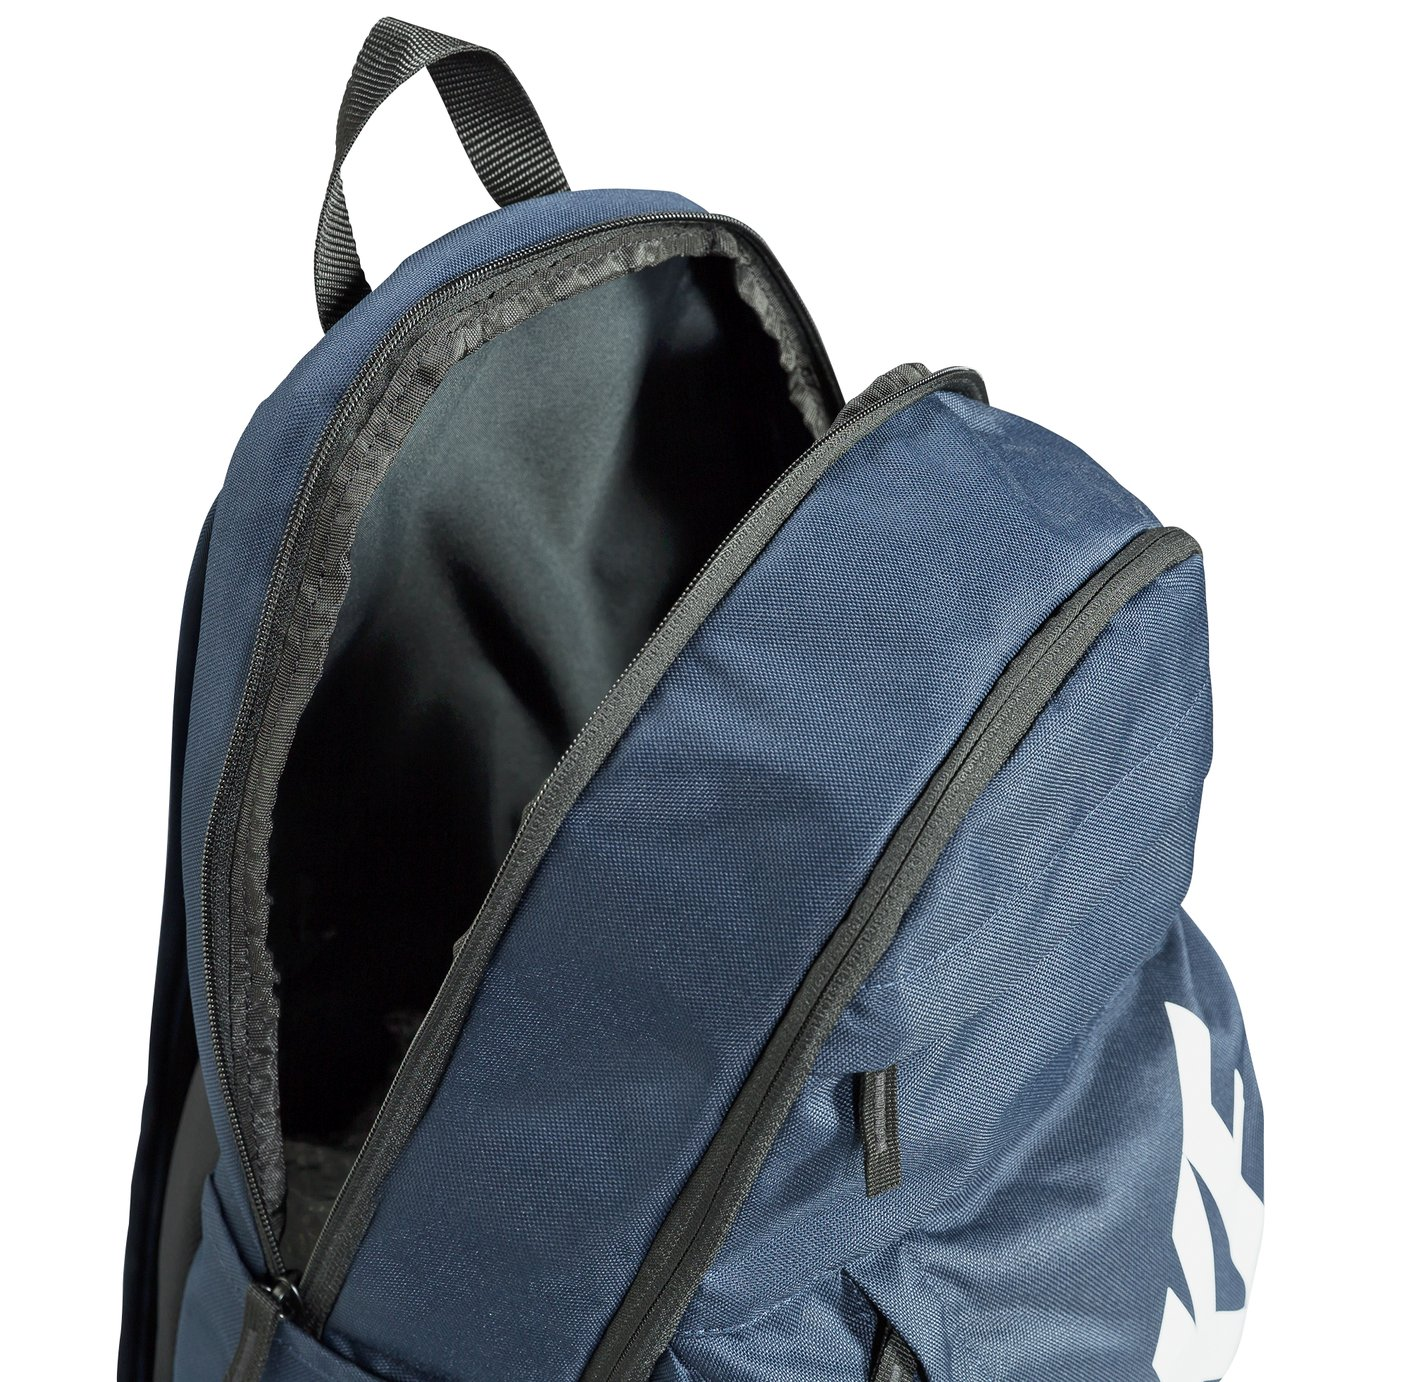 Nike Sportswear Elemental Backpack - Black